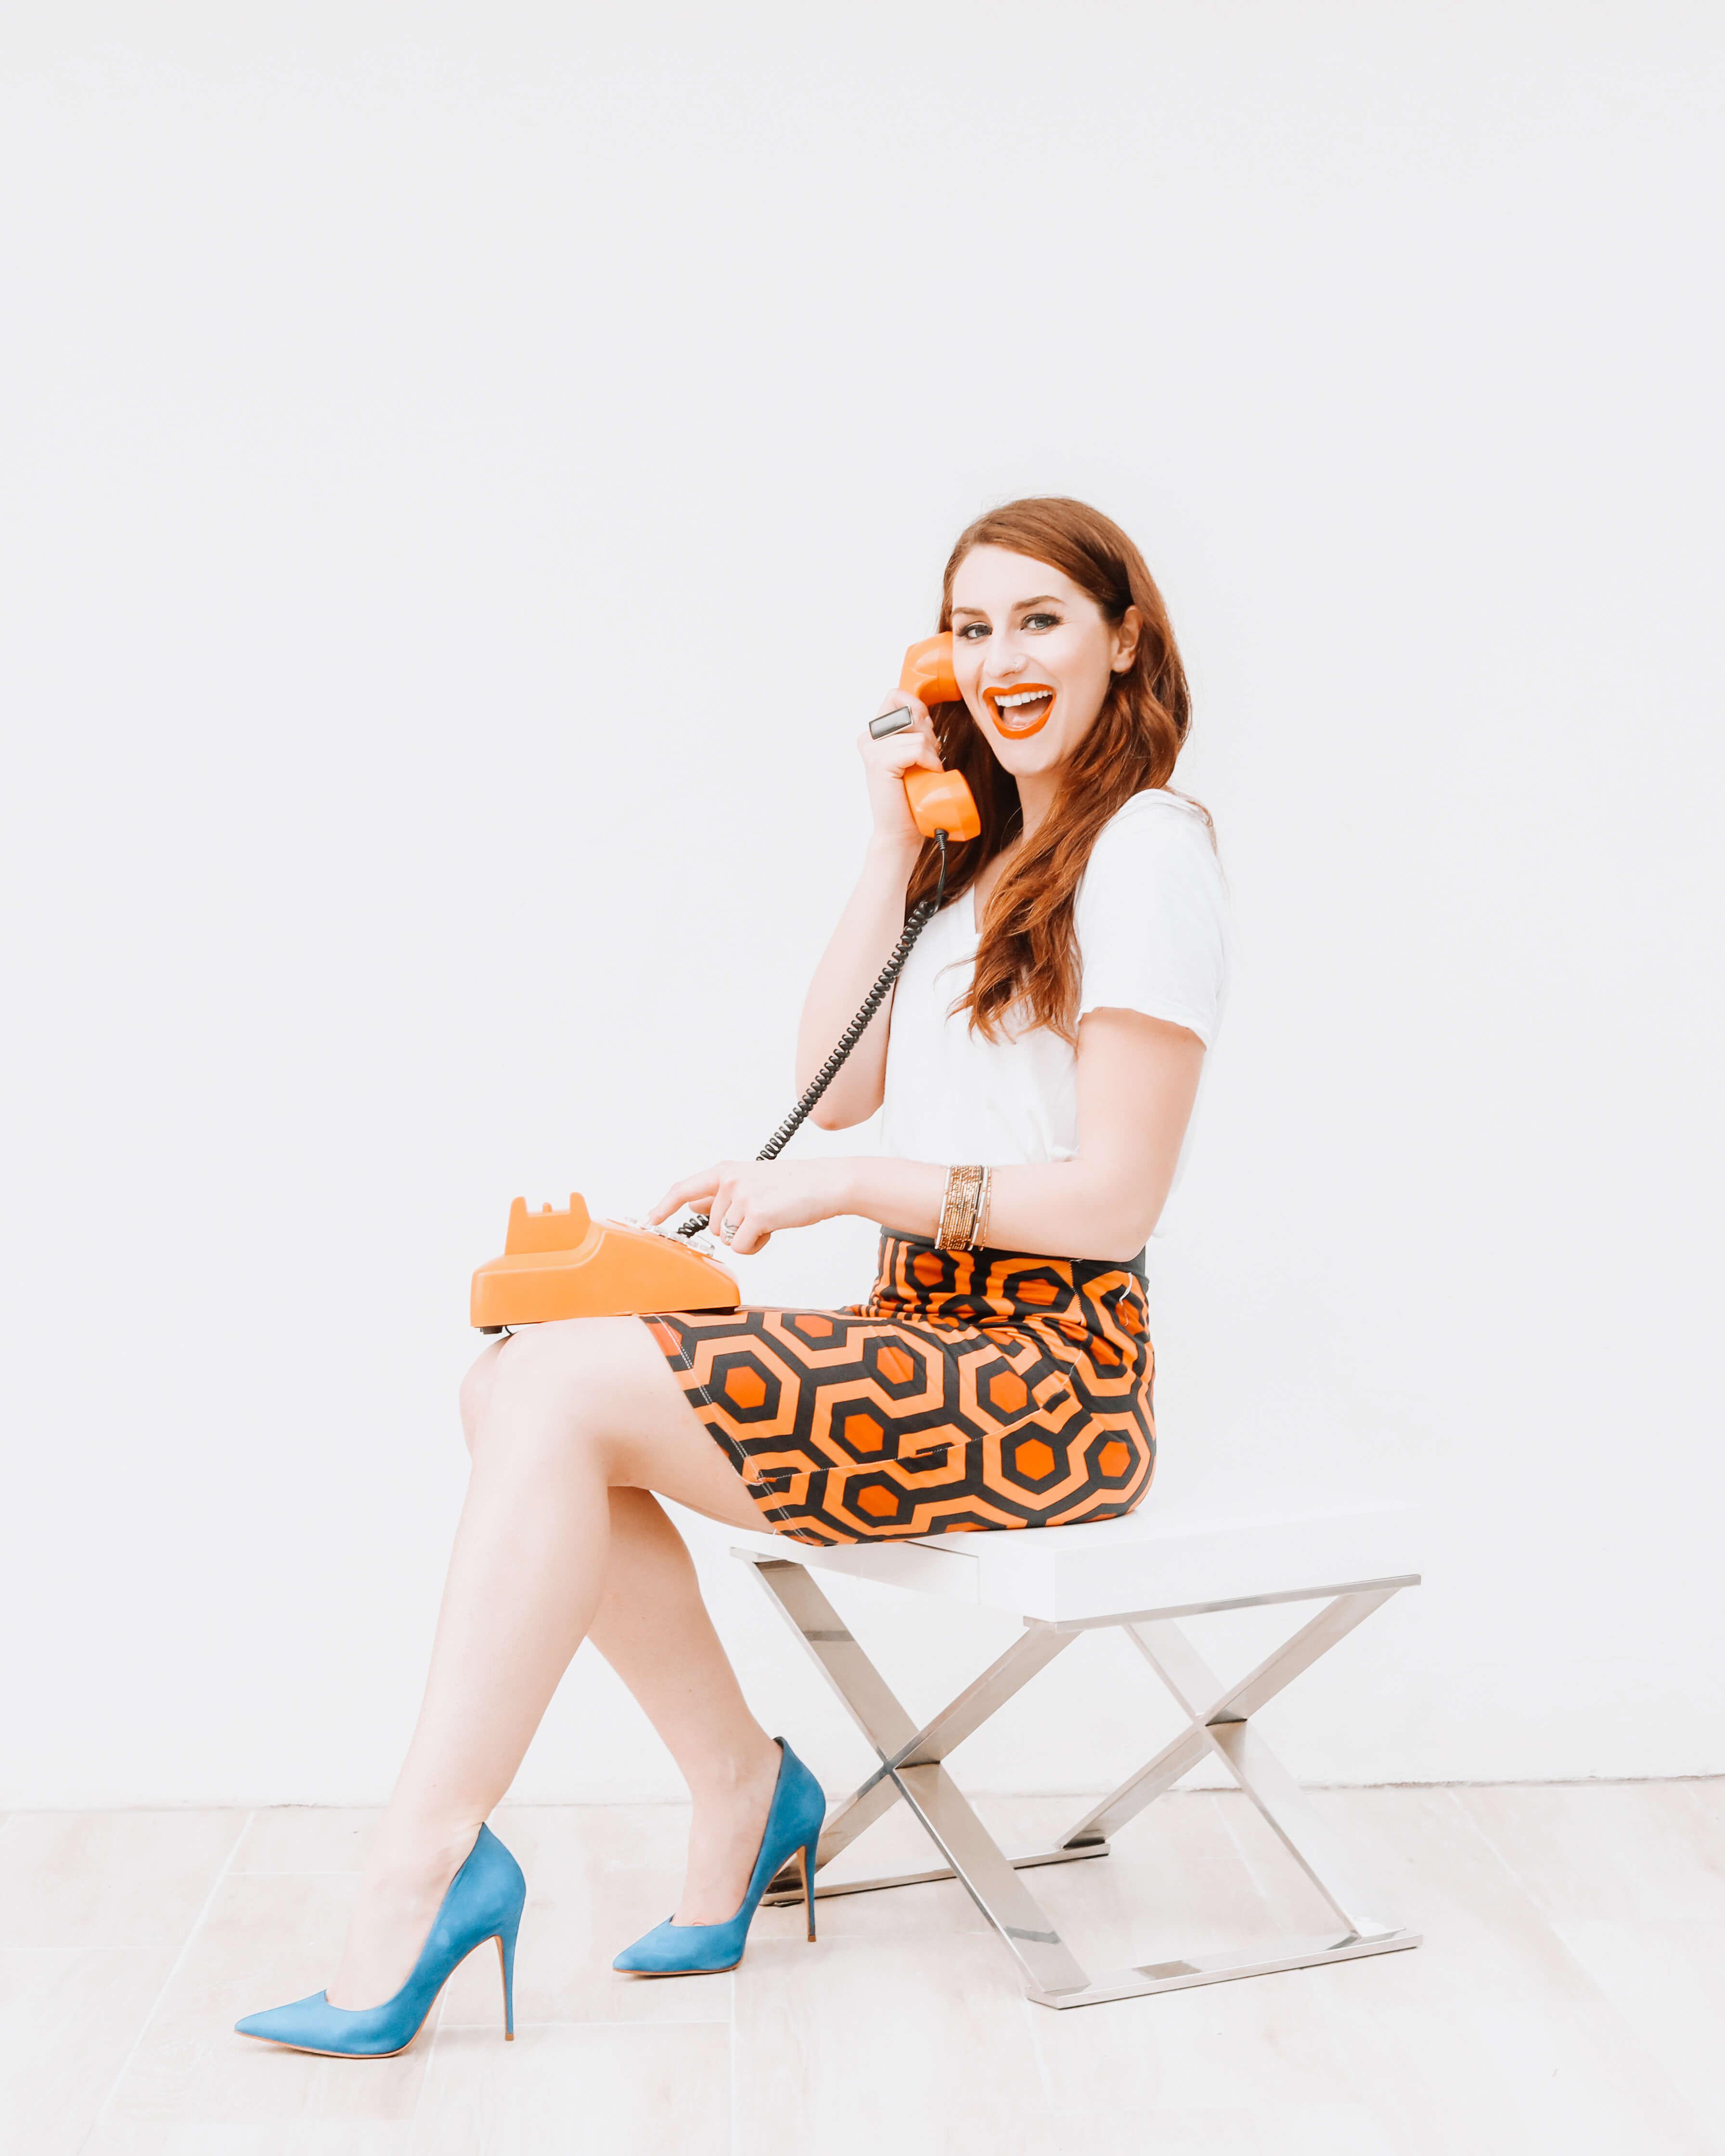 Photo of Sarah Zerkel on the phone